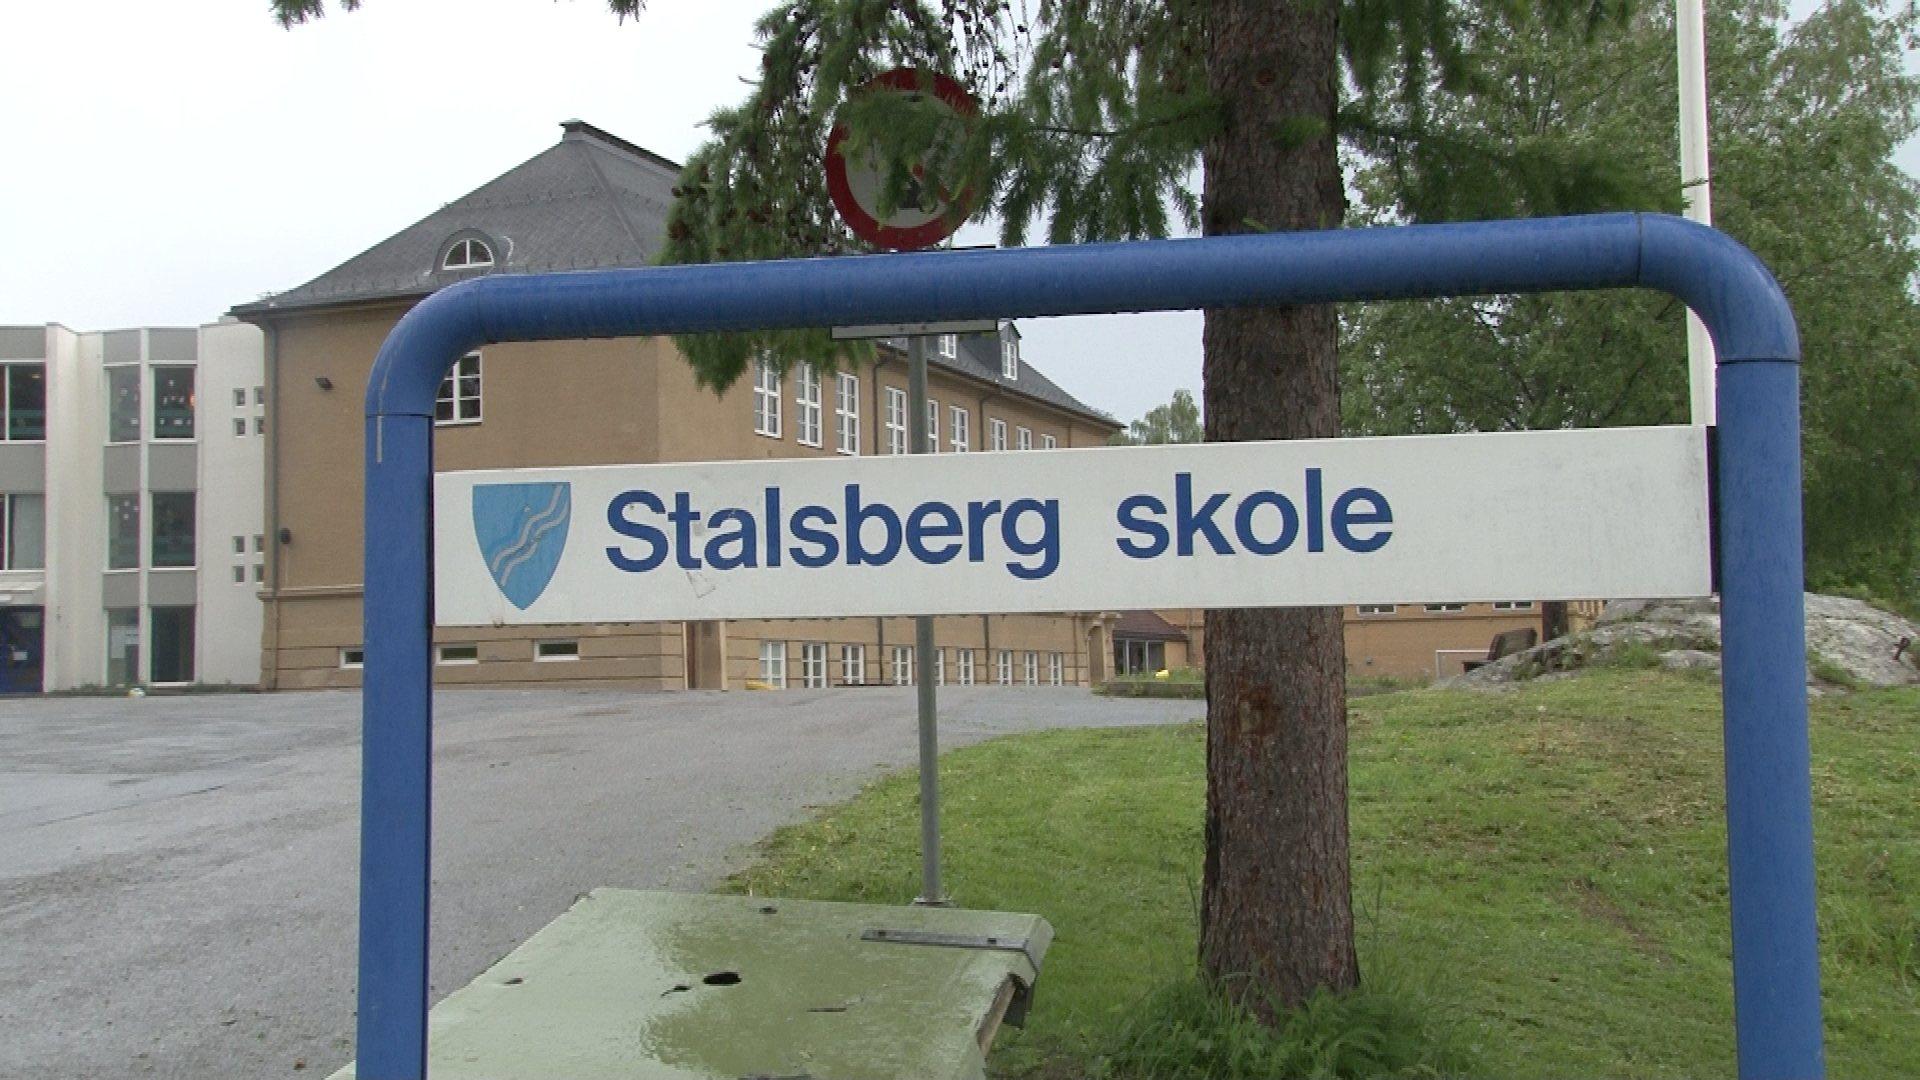 Rektortøbbel ved Stalsberg skole